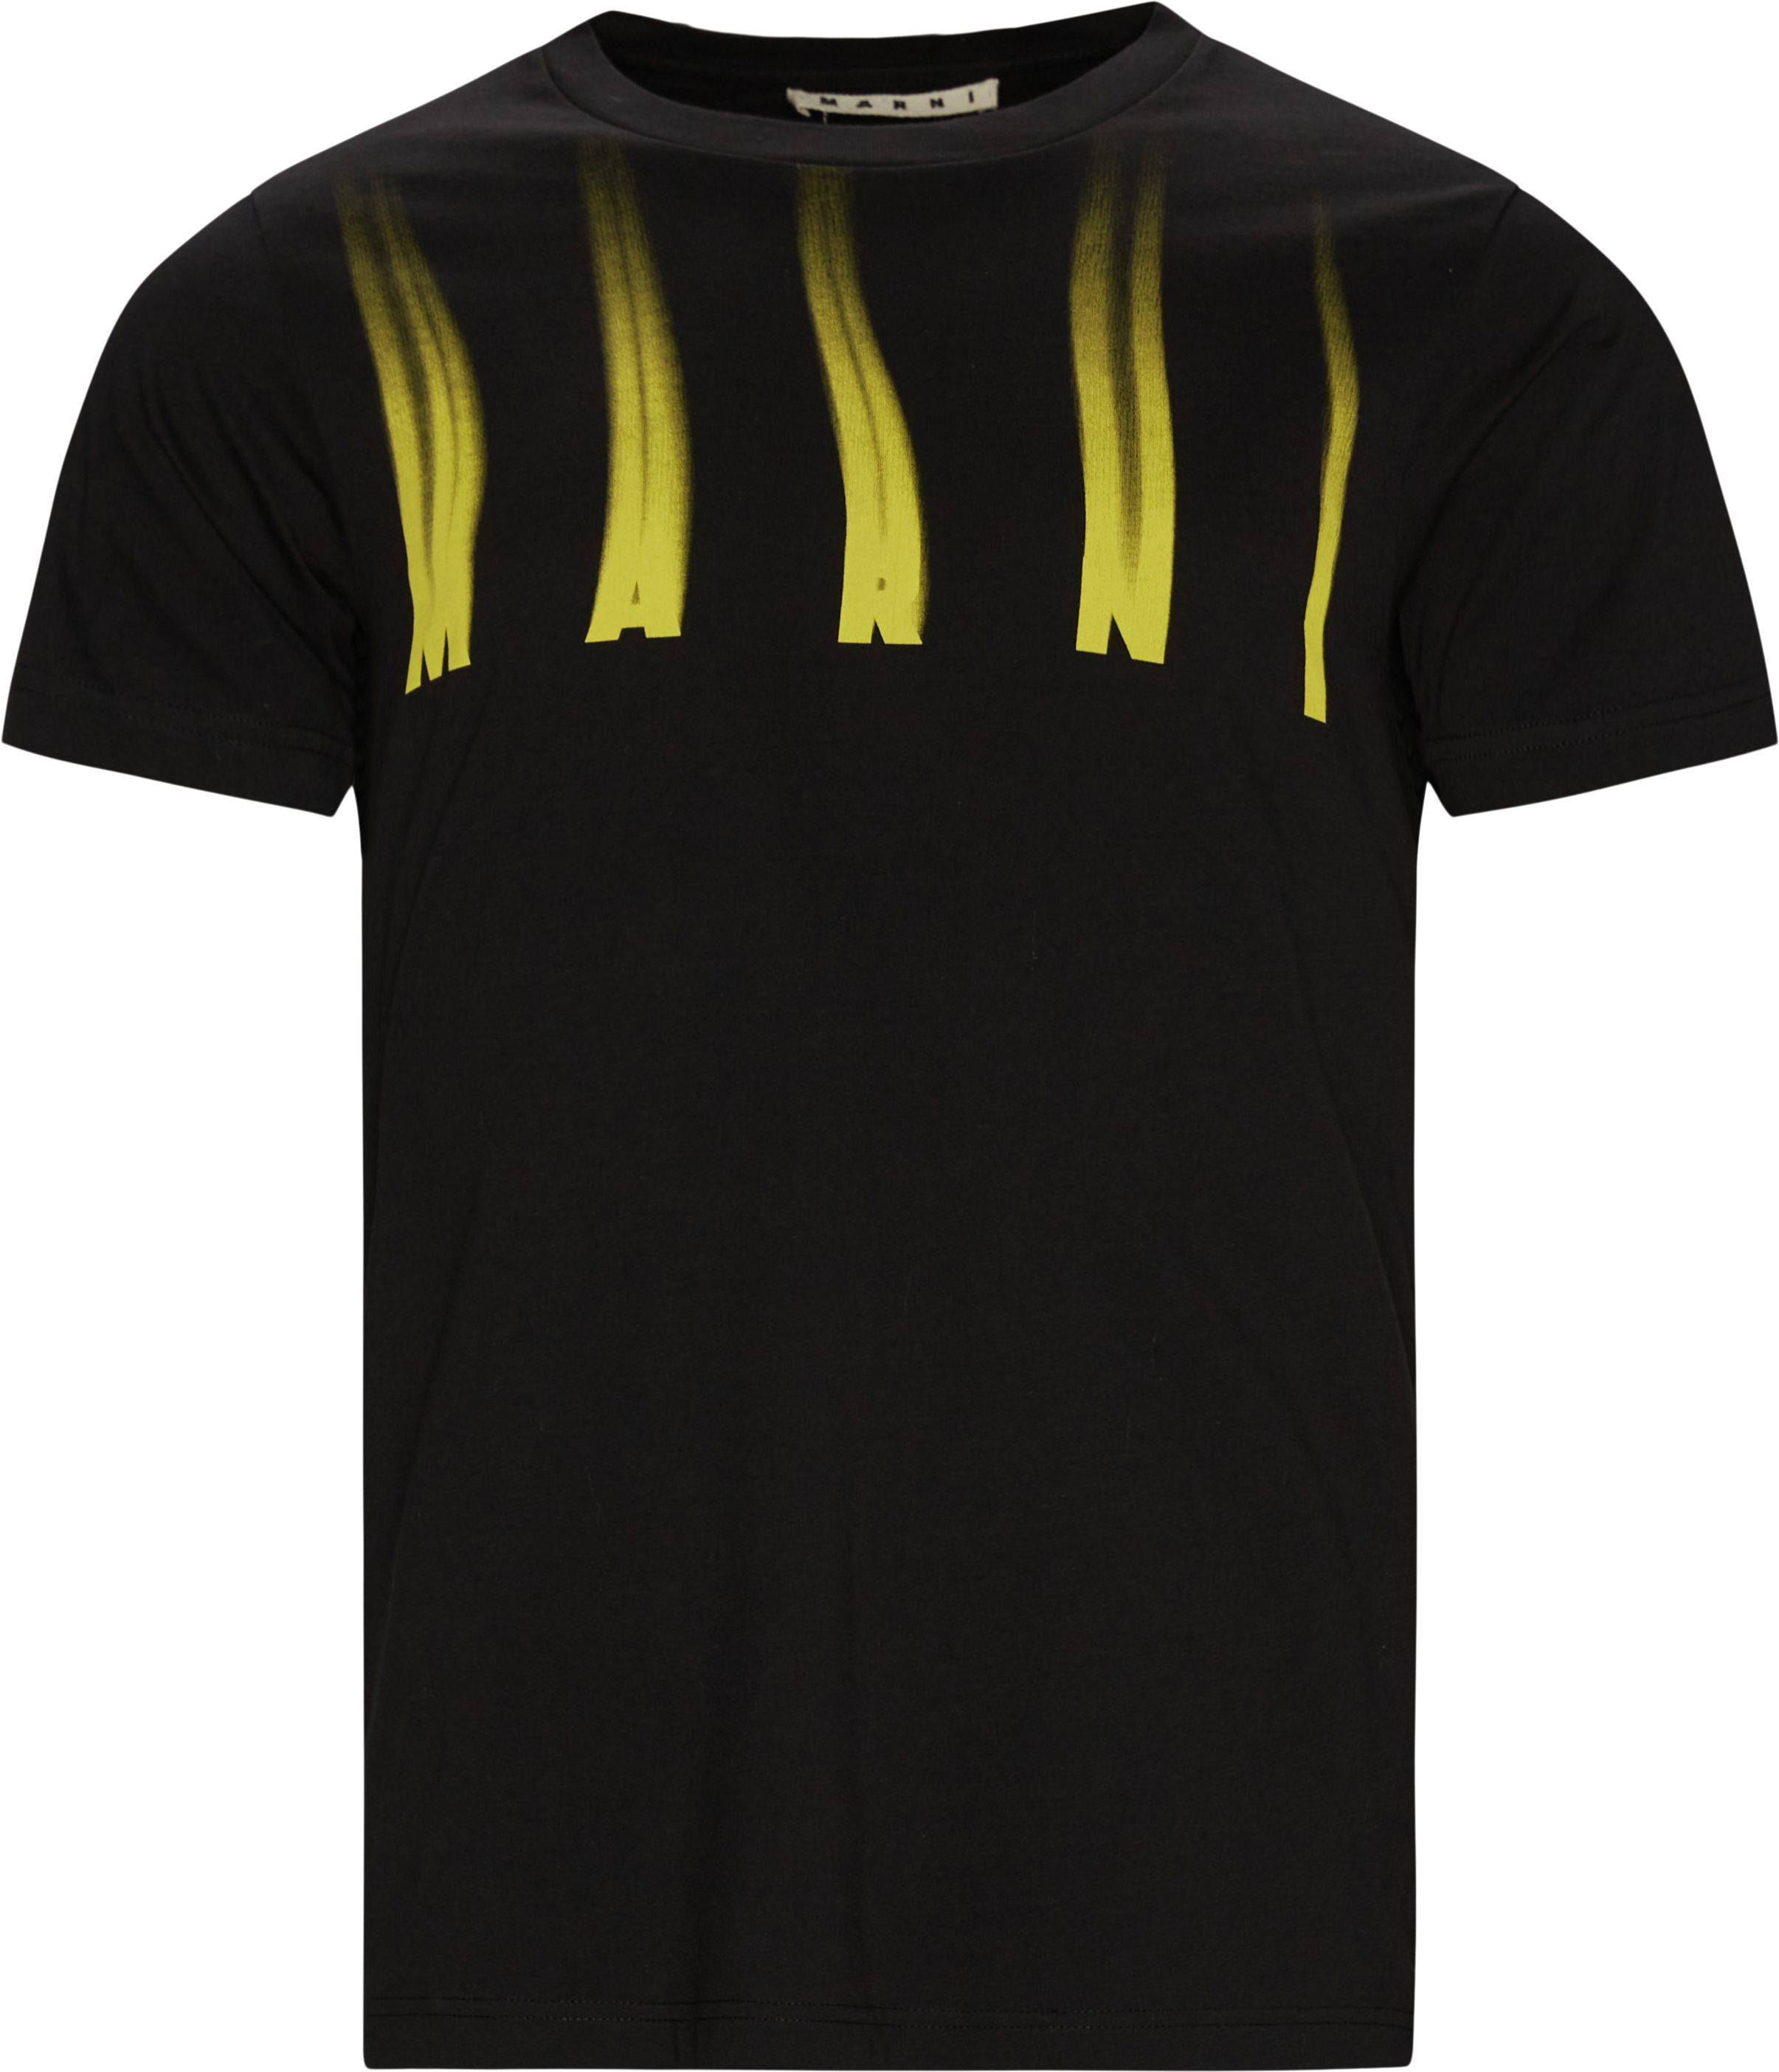 Burn Tee - T-shirts - Regular fit - Sort